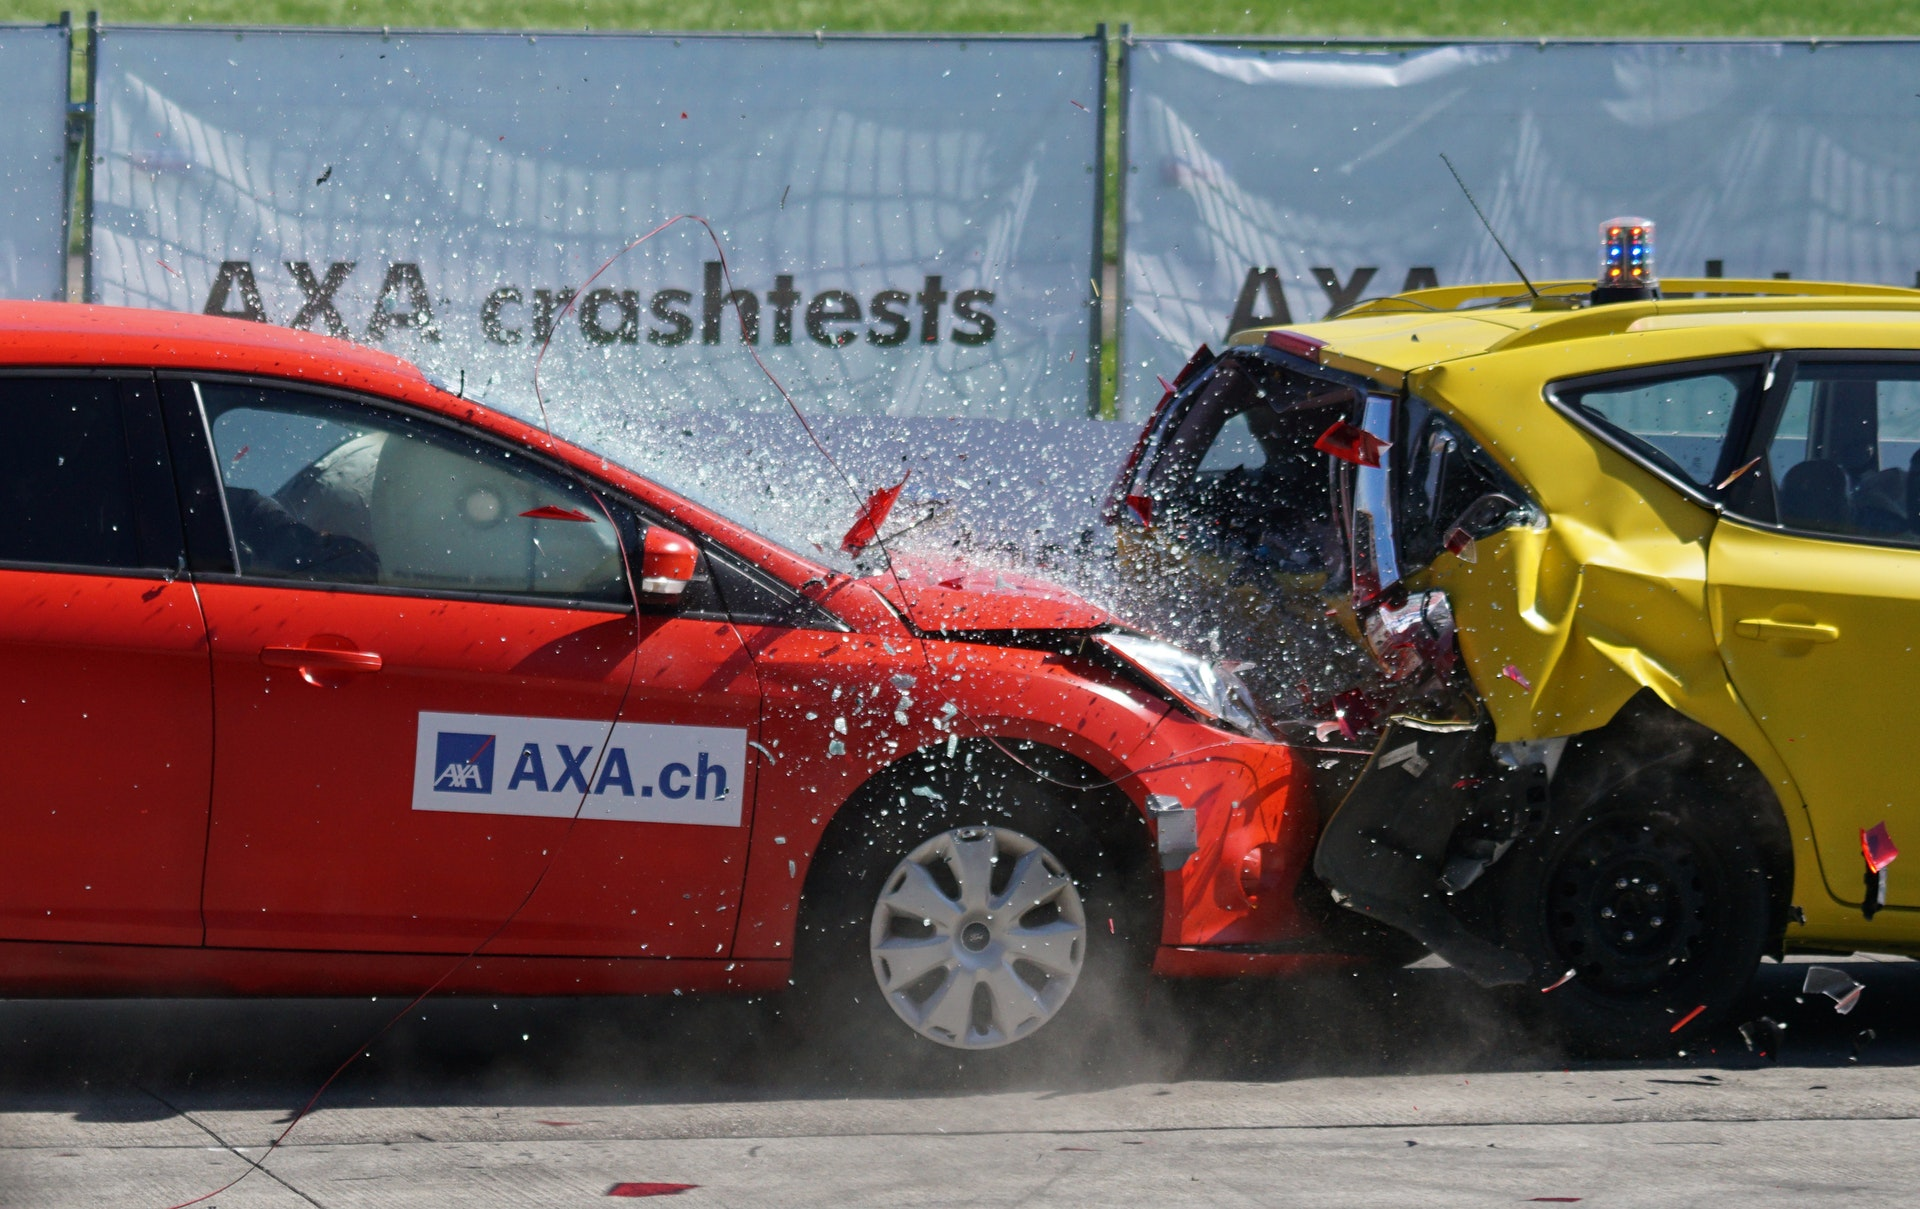 https://kaitrade.cz/media/aktuality/red-and-yellow-hatchback-axa-crash-tests-163016.jpg